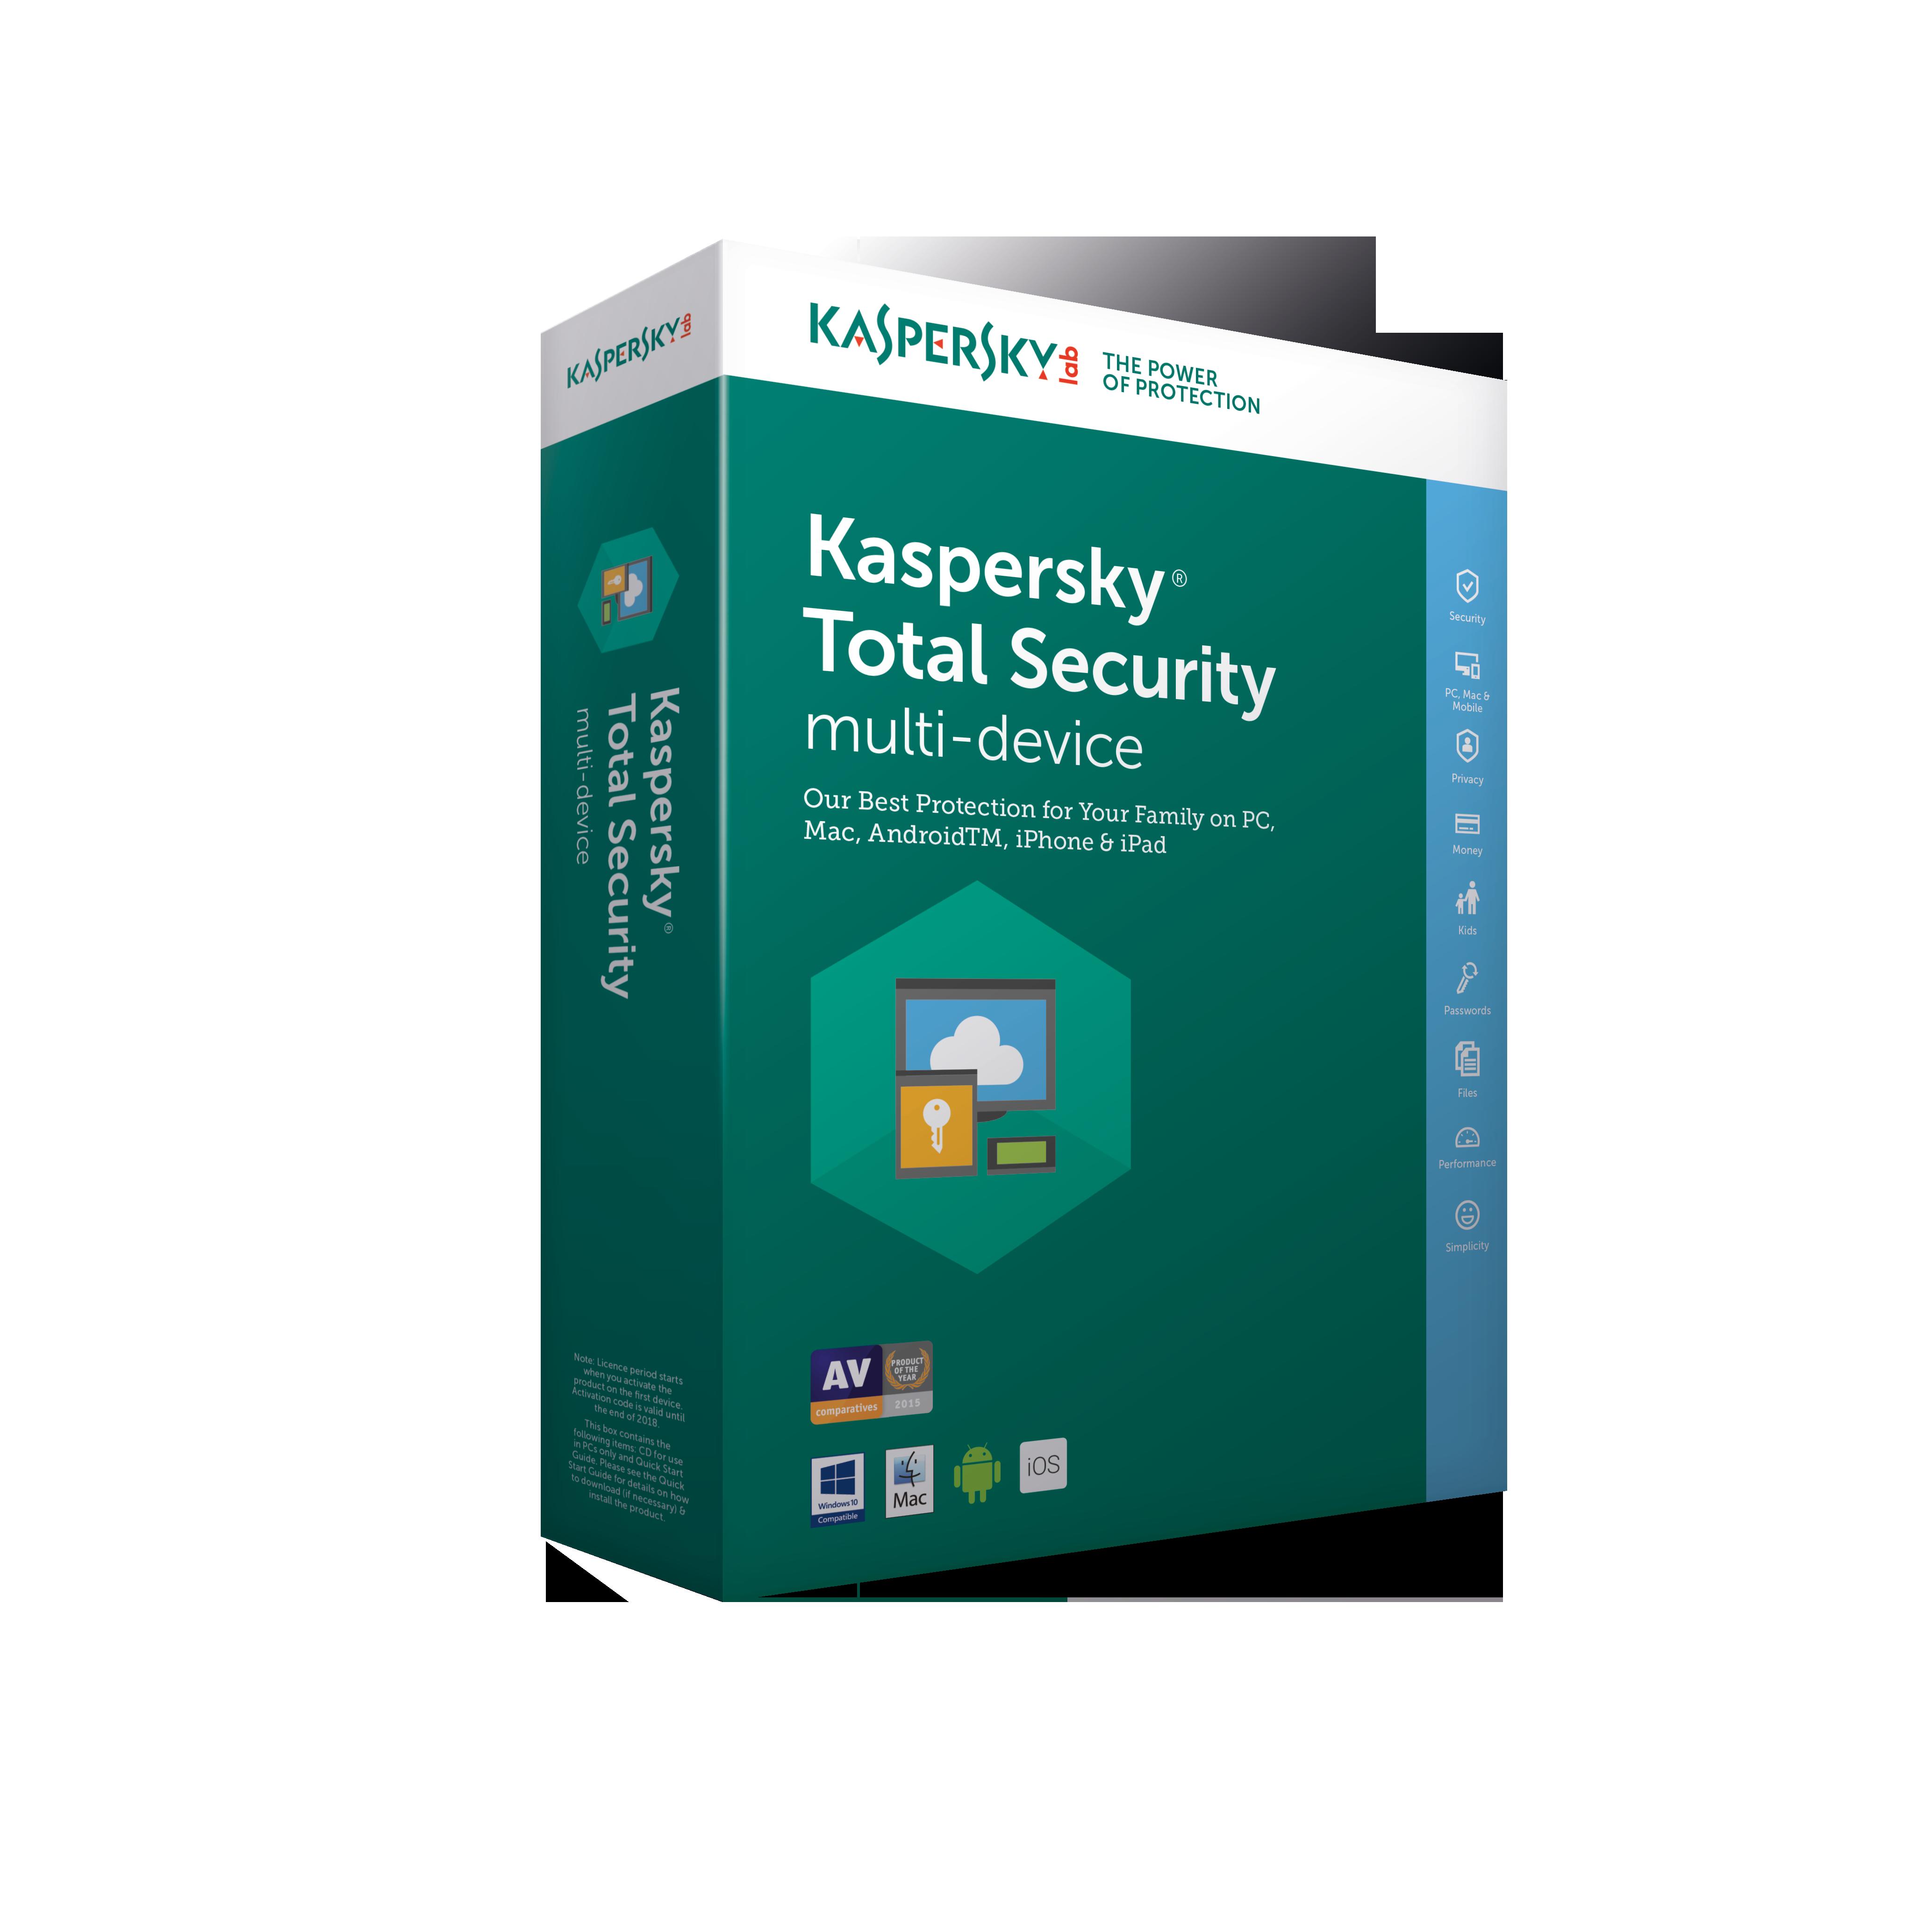 Kaspersky Total Security MD 2018 CZ, 5x, 2 roky